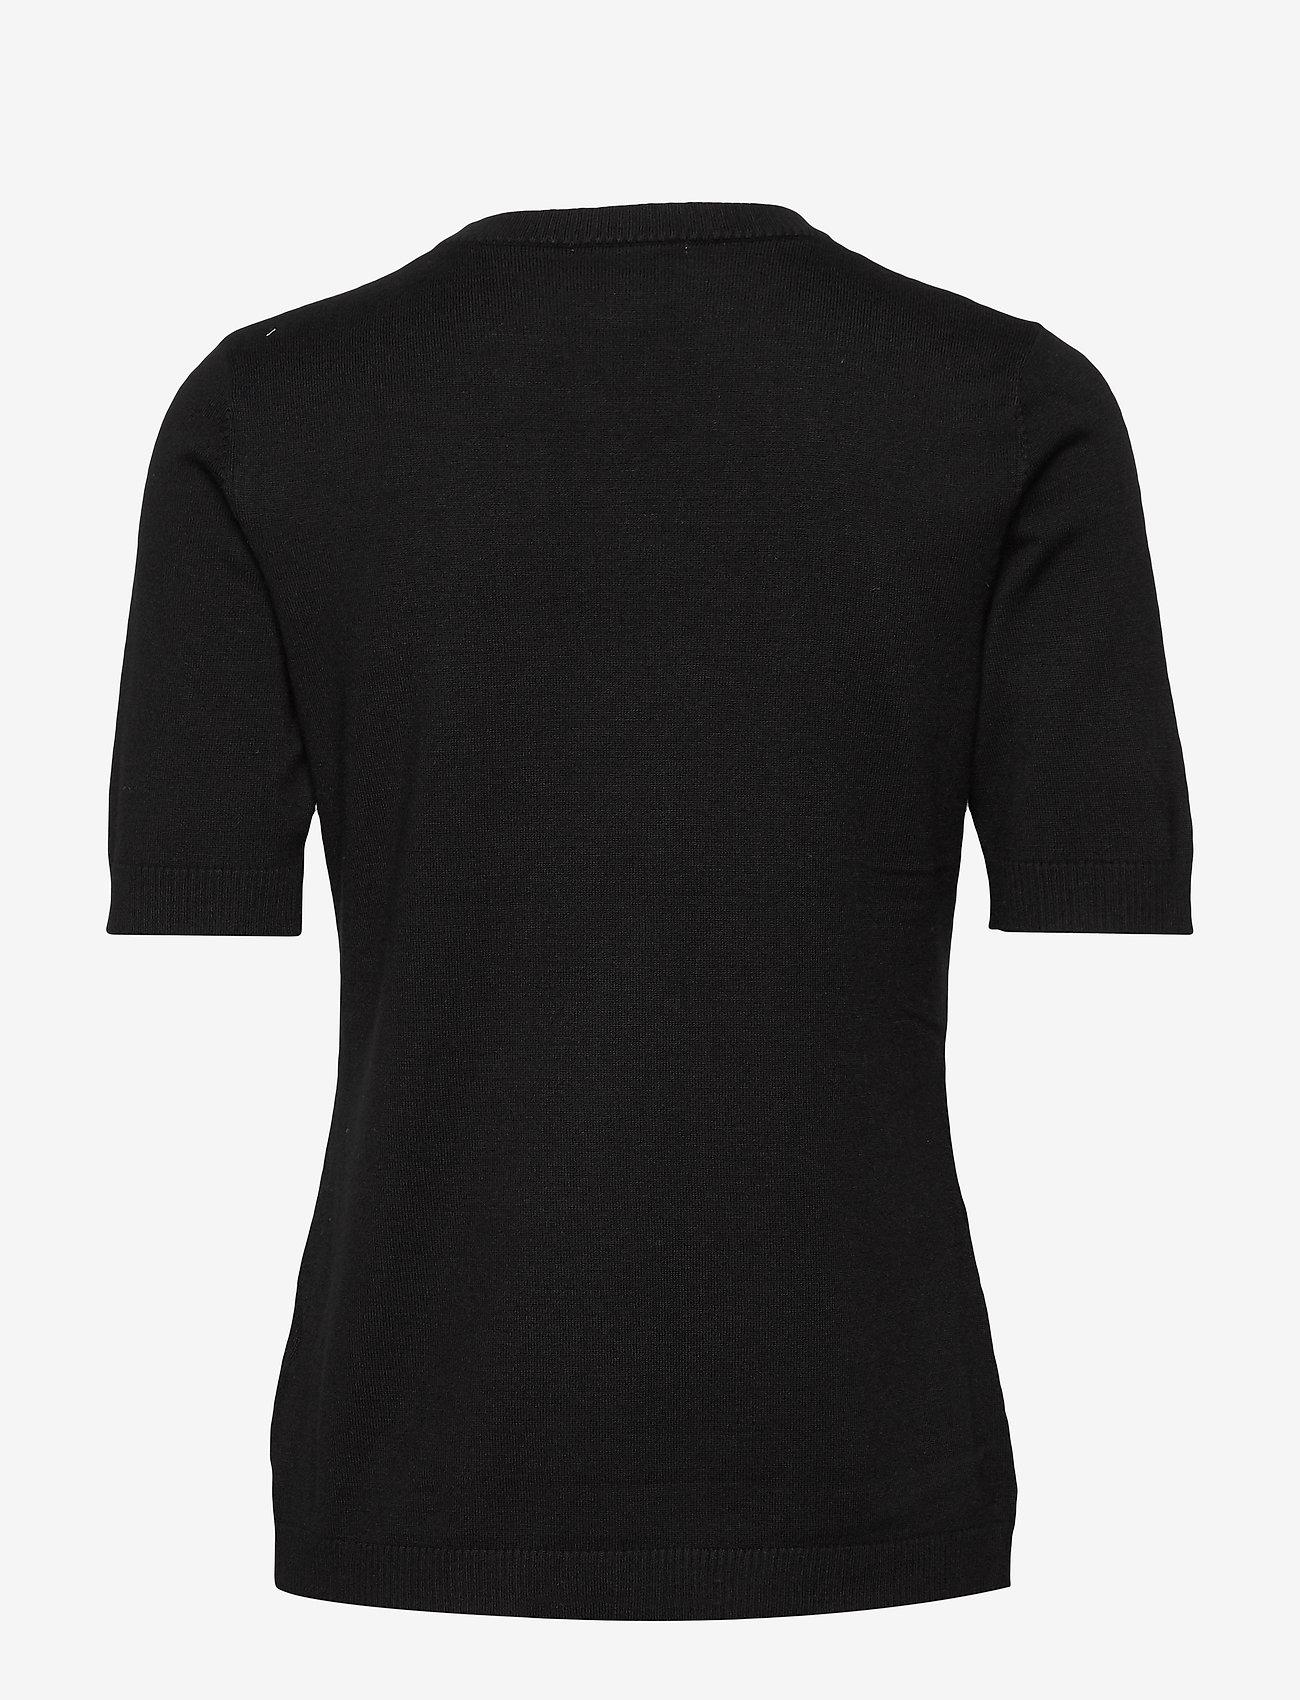 Minus - Pamela knit tee - gebreide t-shirts - sort - 1